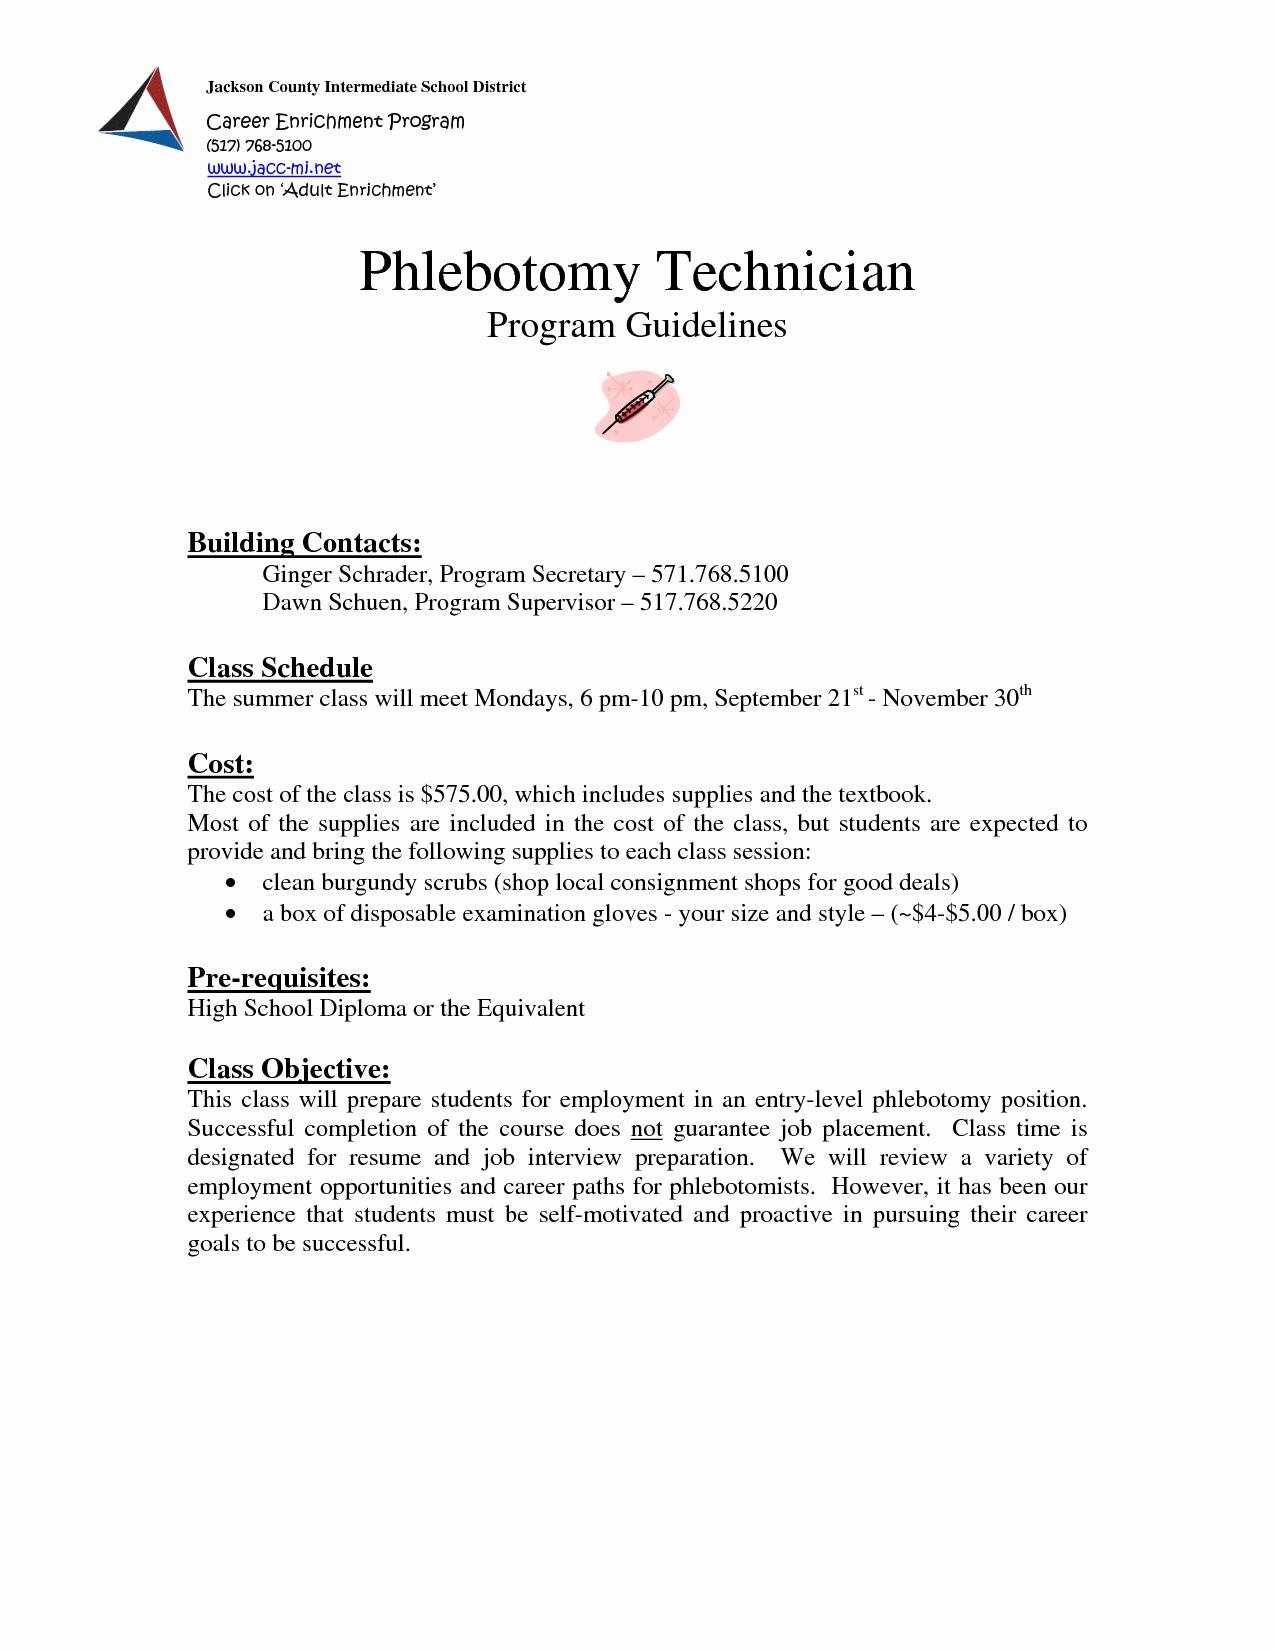 phlebotomy cover letter entry level